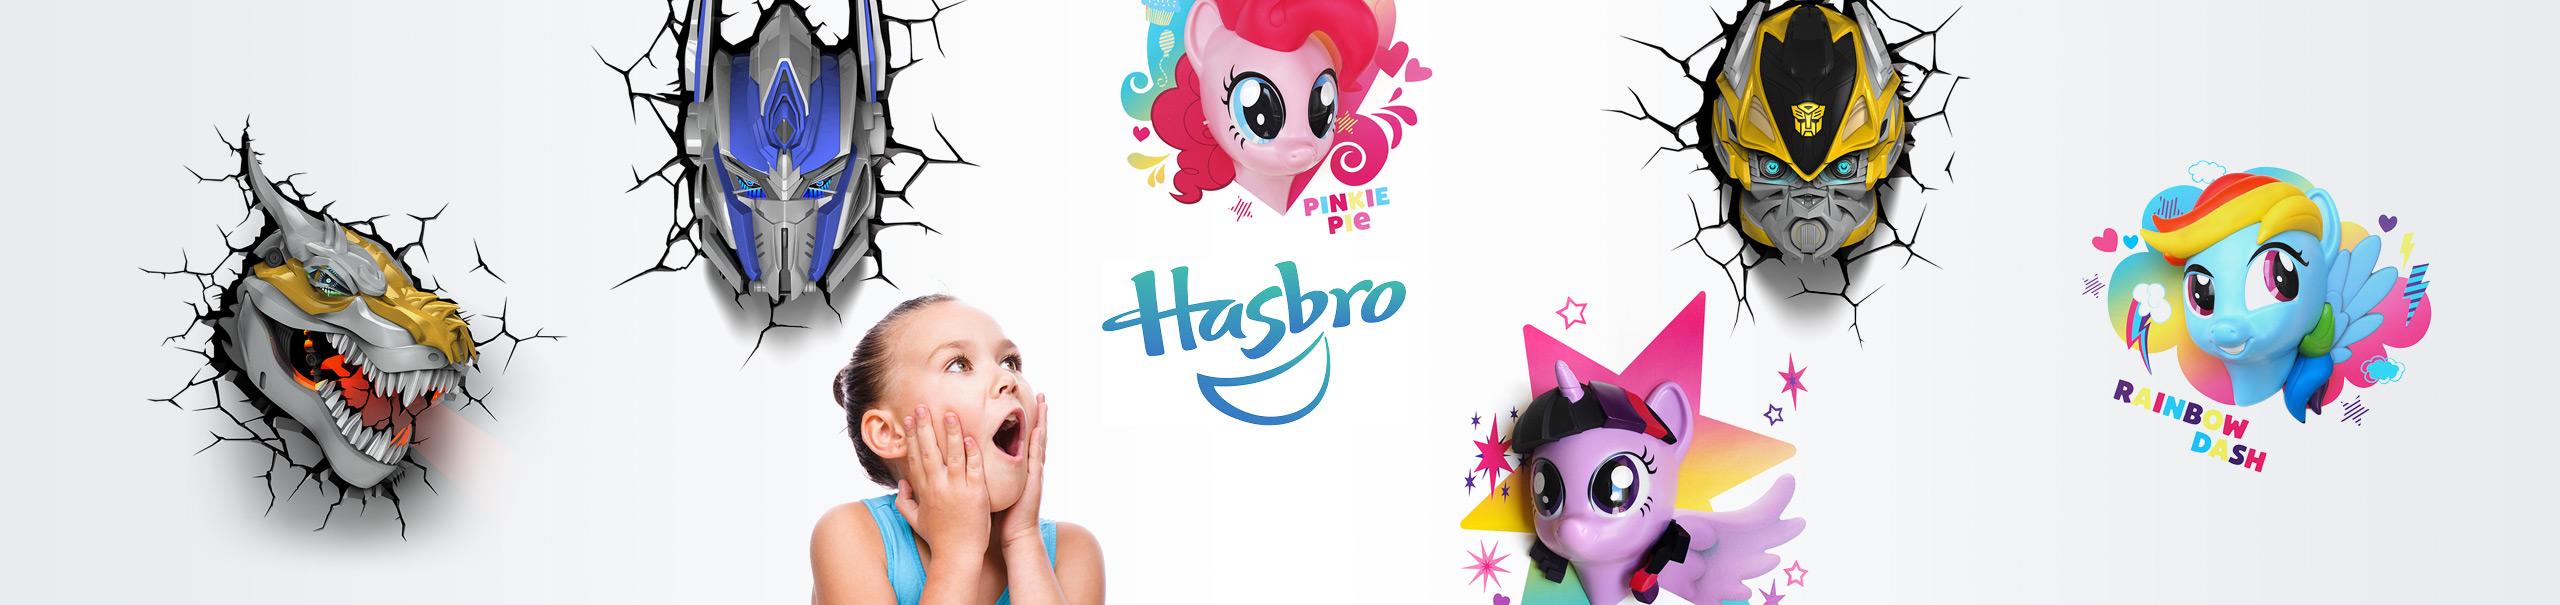 Hasbro Banner